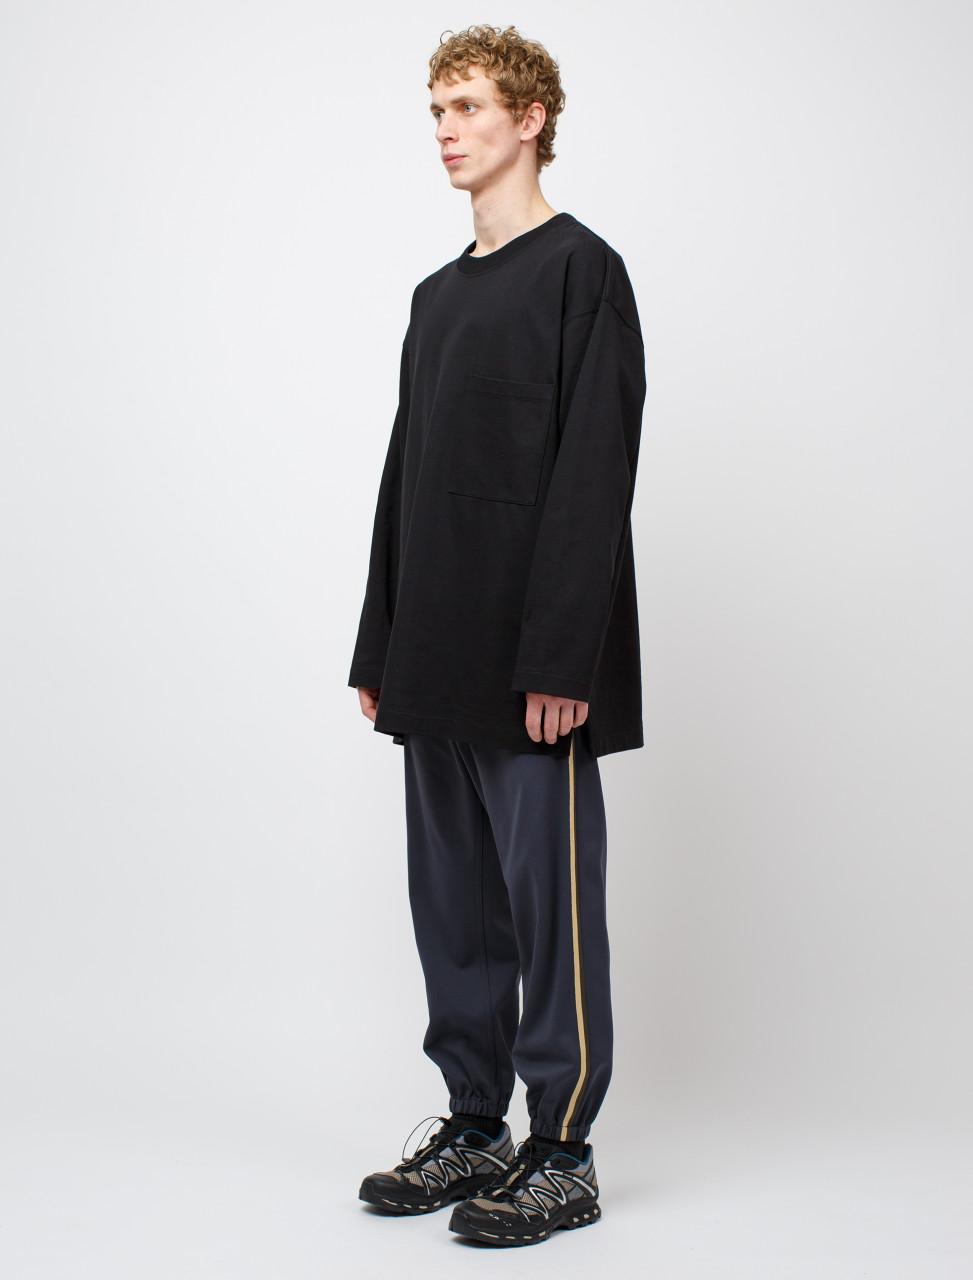 Trousers in Dark Grey